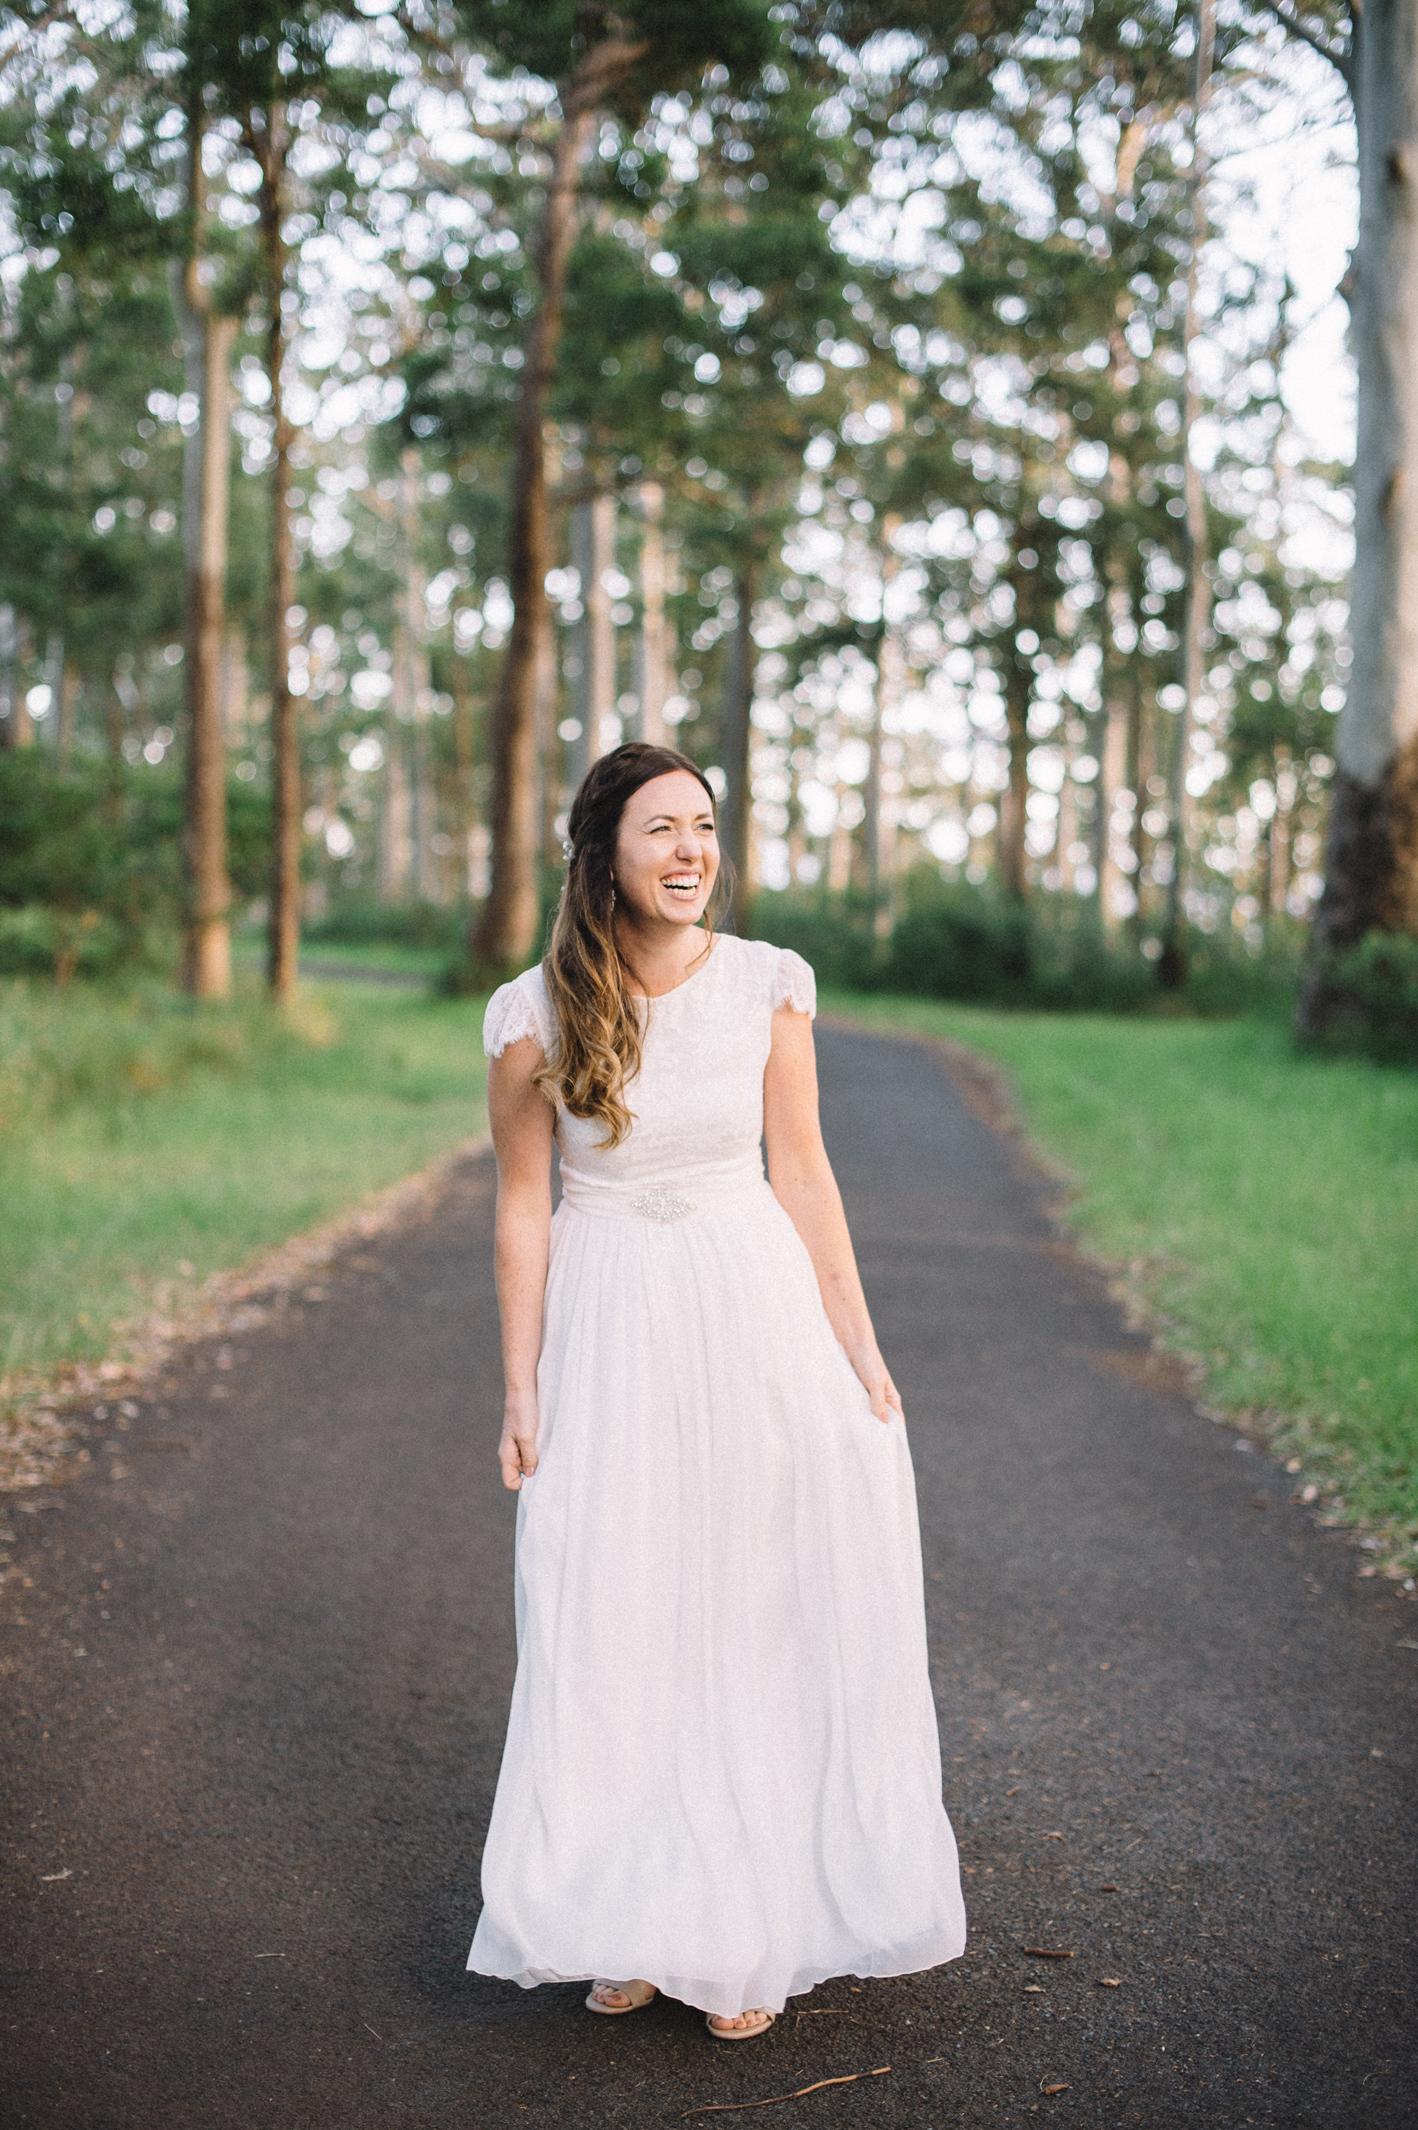 062-michelle-reagan-mount-tamborine-wedding-sophie-baker-photography